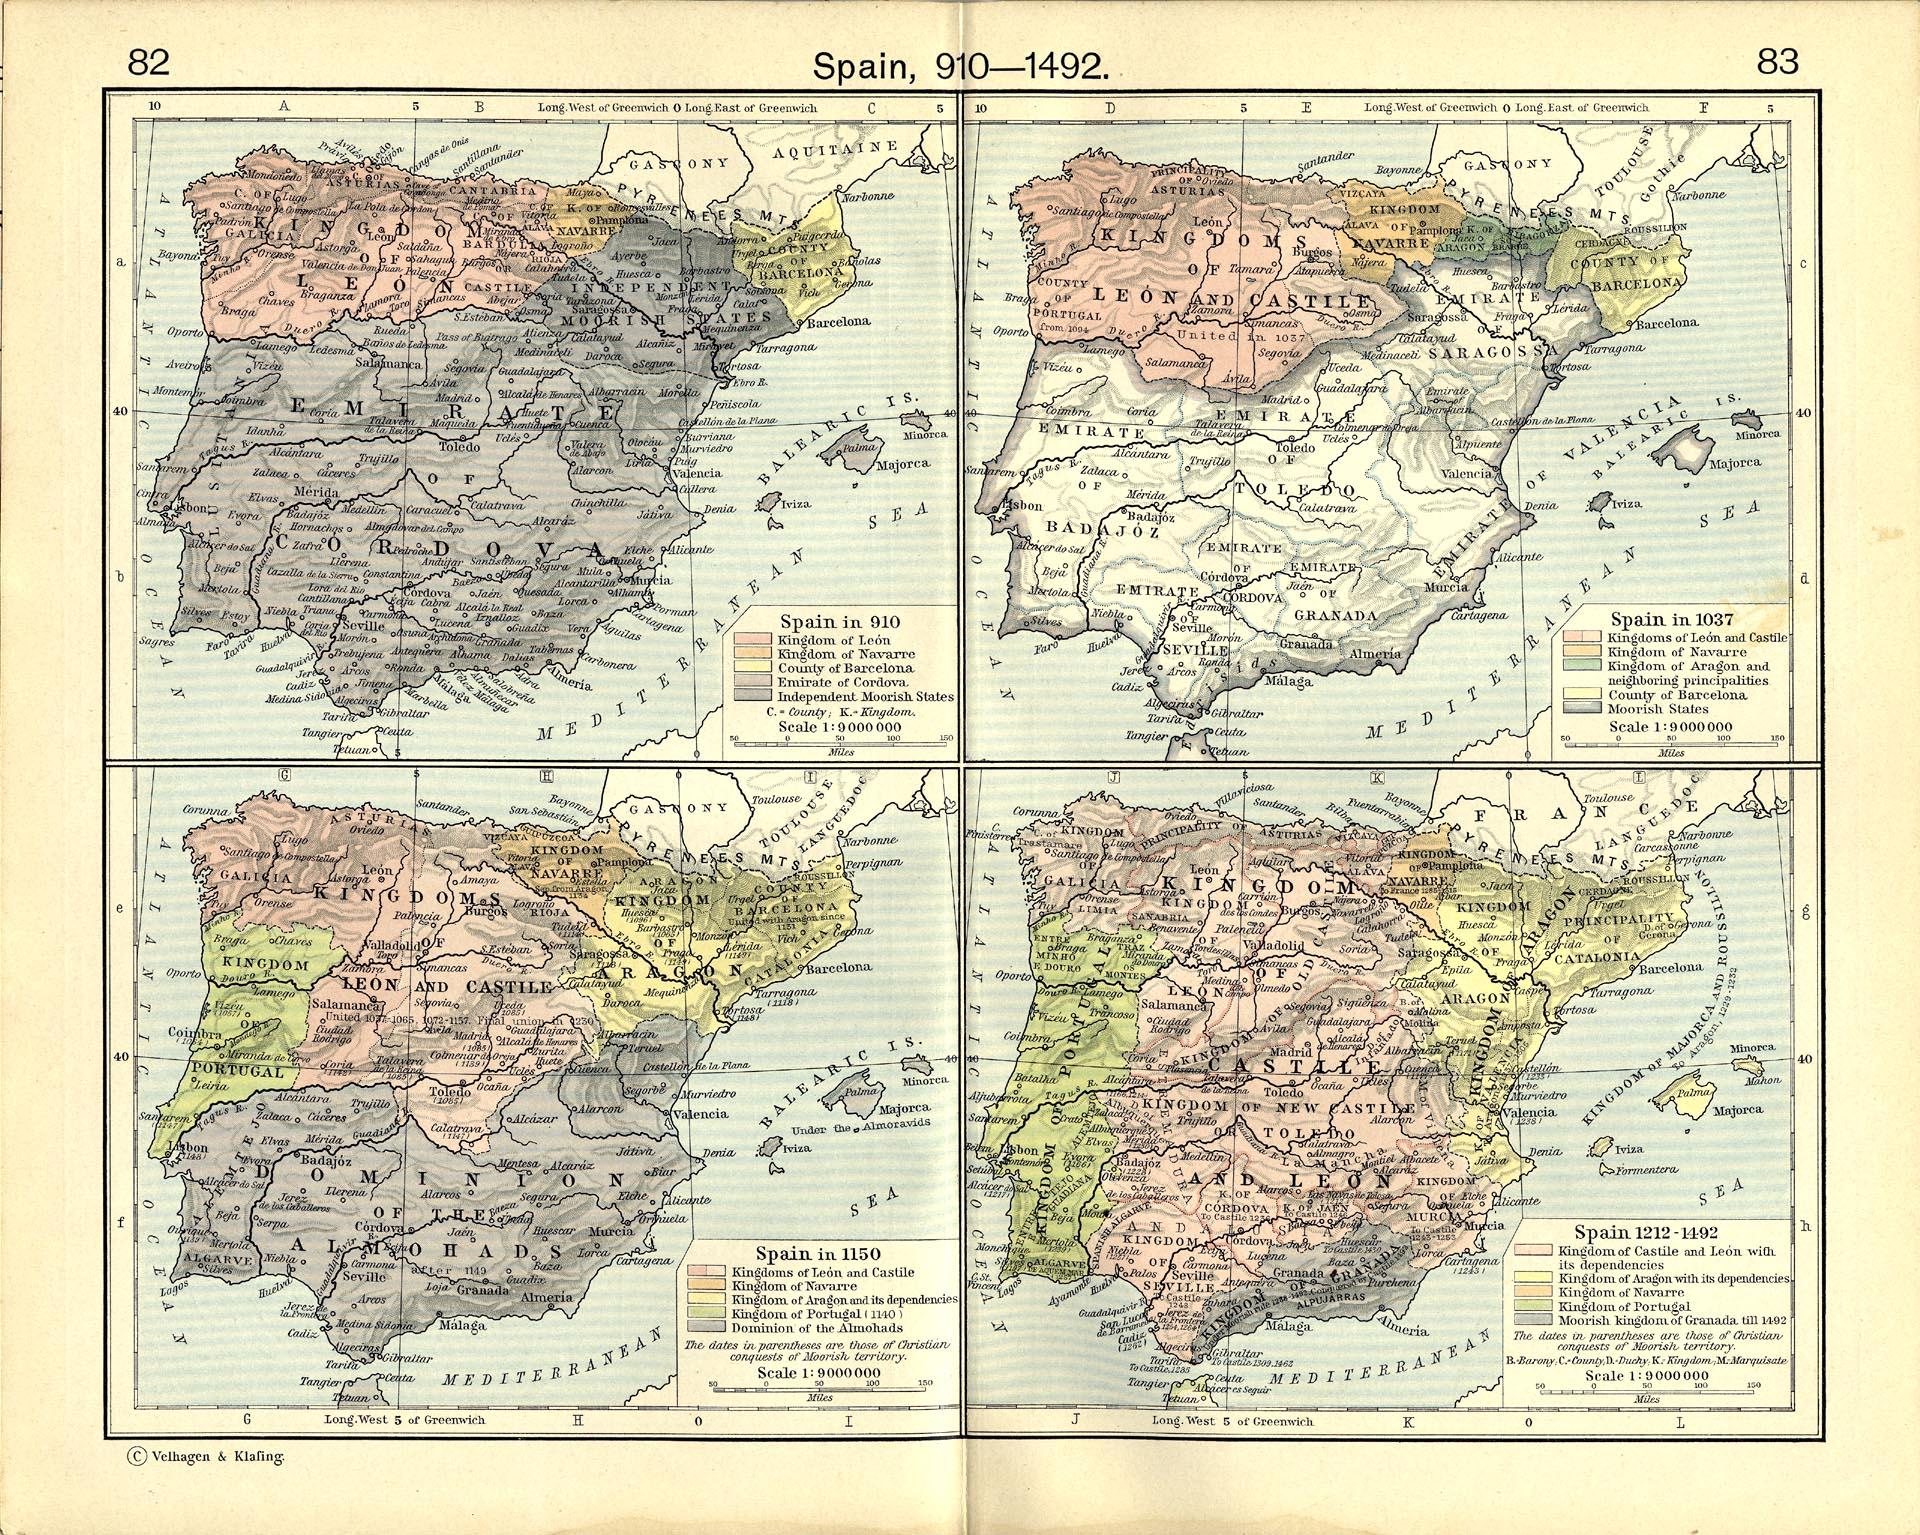 Moorish History in Spain The Moorish Areas of Spain